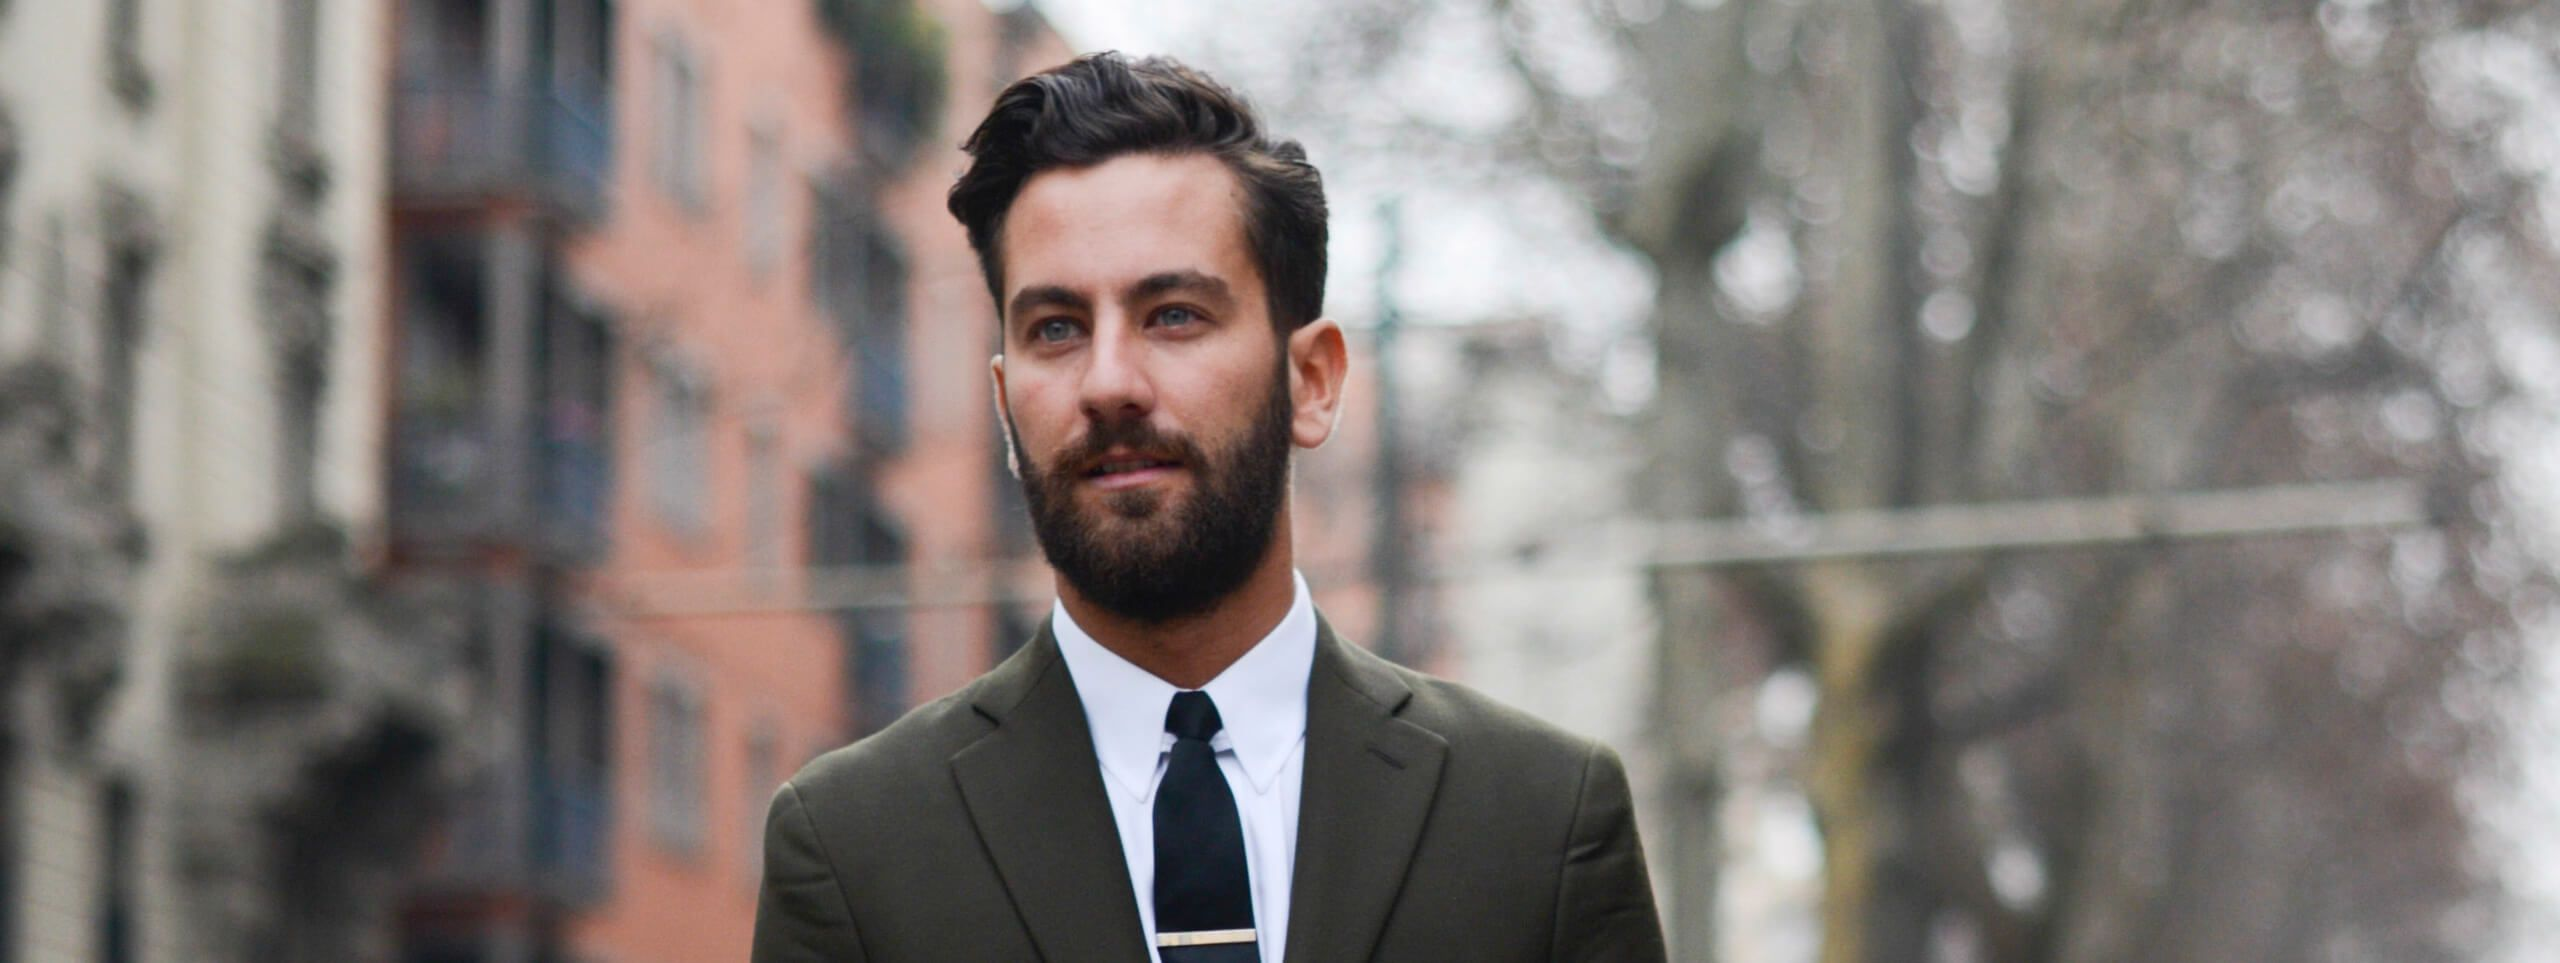 Hombre estilo street style con traje con pelo corto